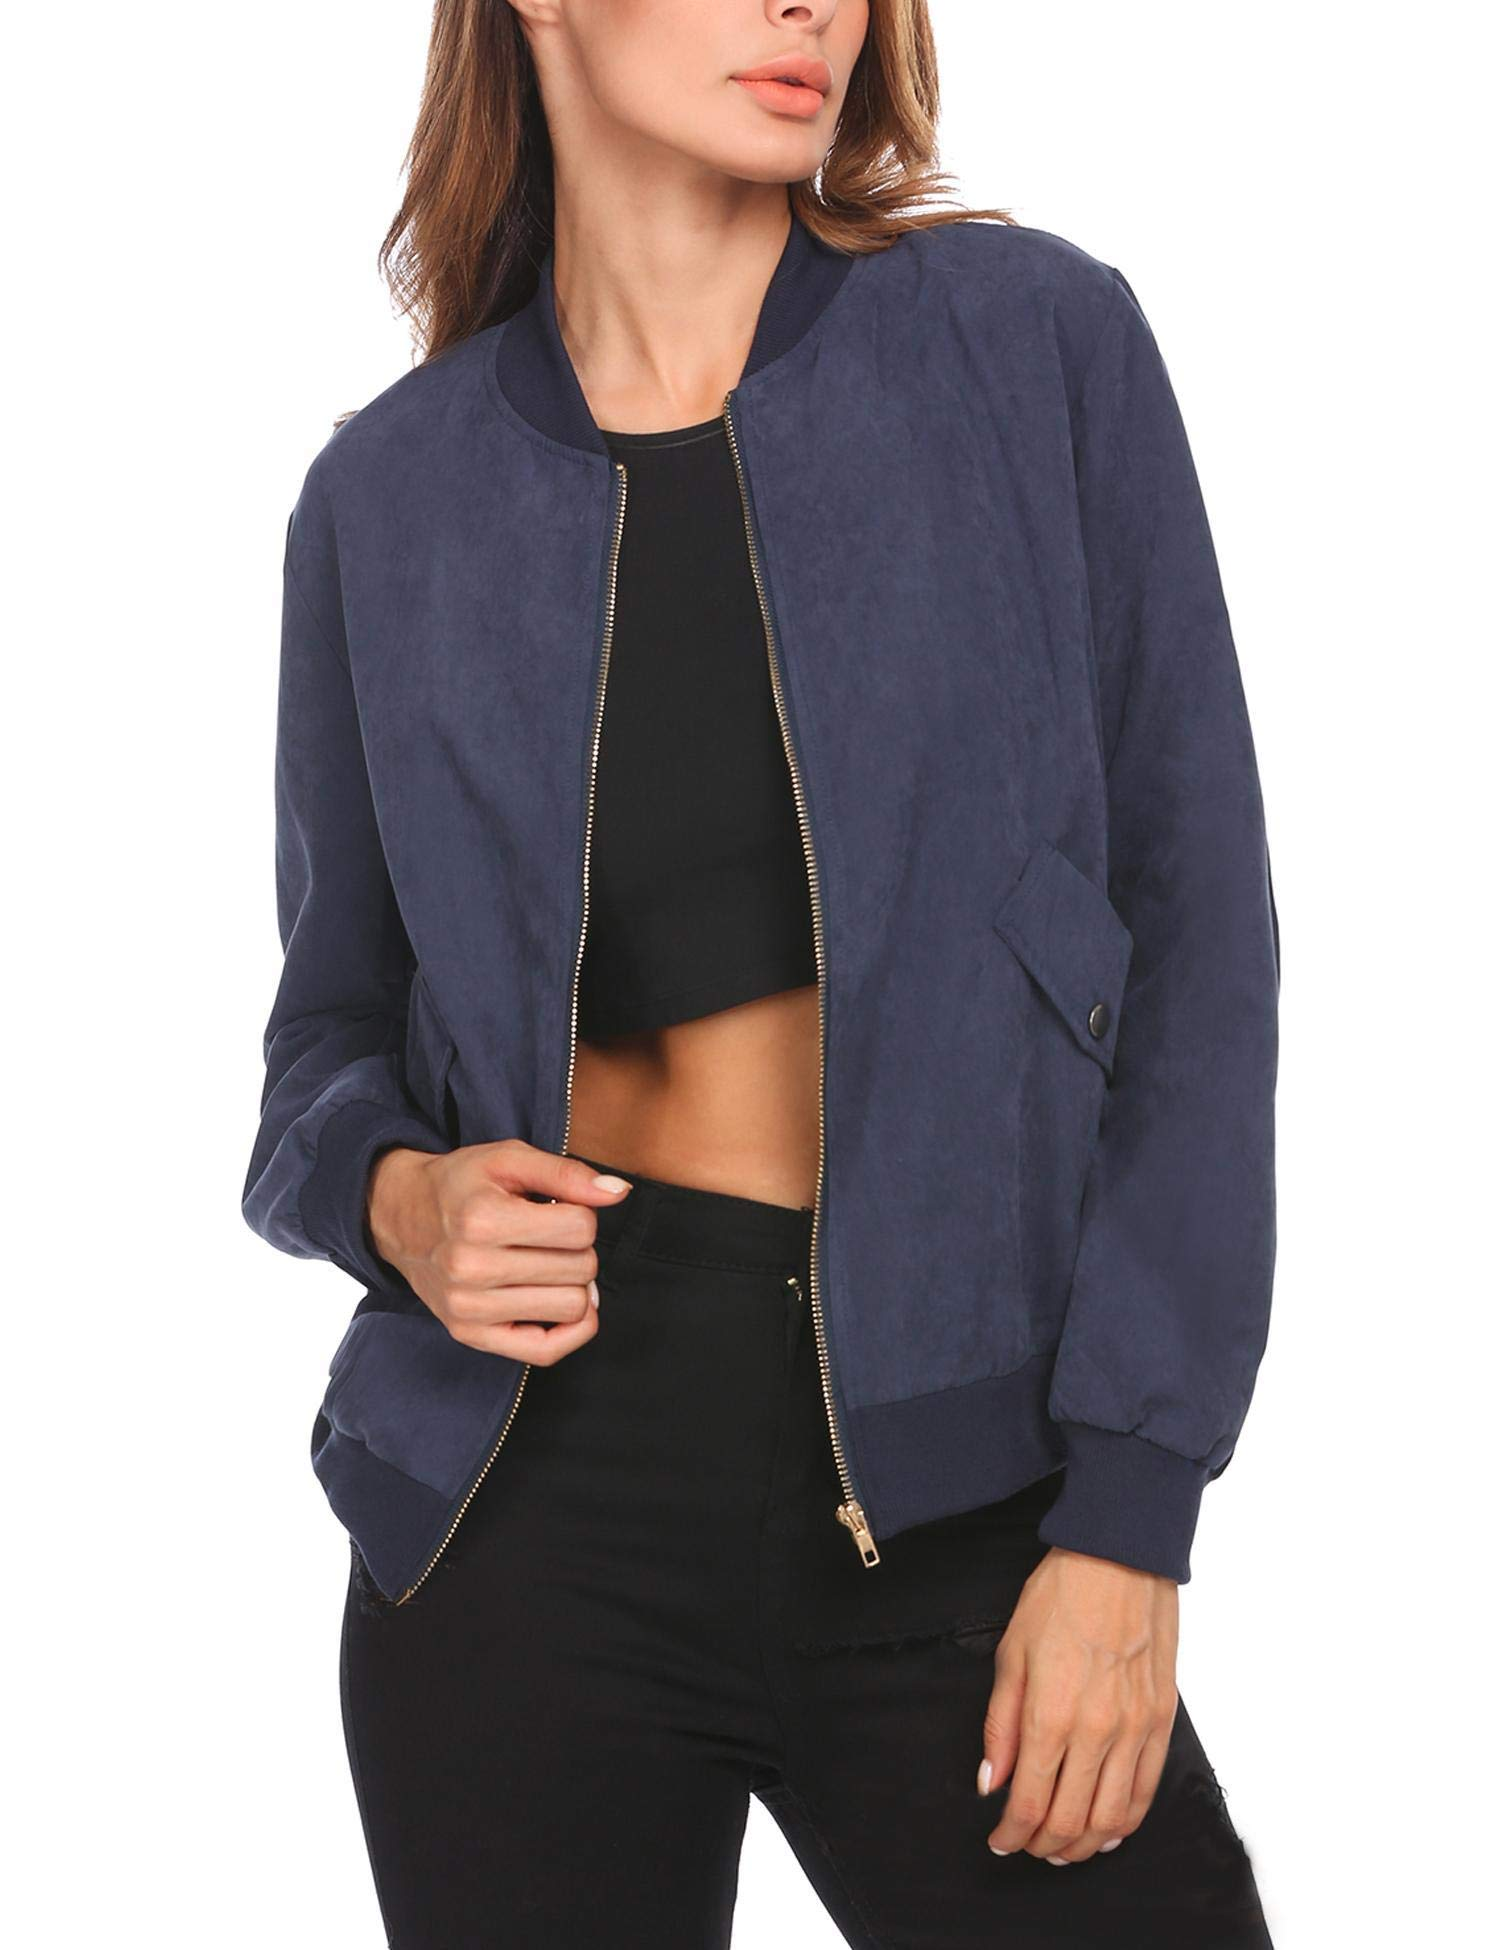 ELESOL Women's Zip Up Bomber Jacket Classic Lightweight Short Jacket with Pockets Navy Blue M